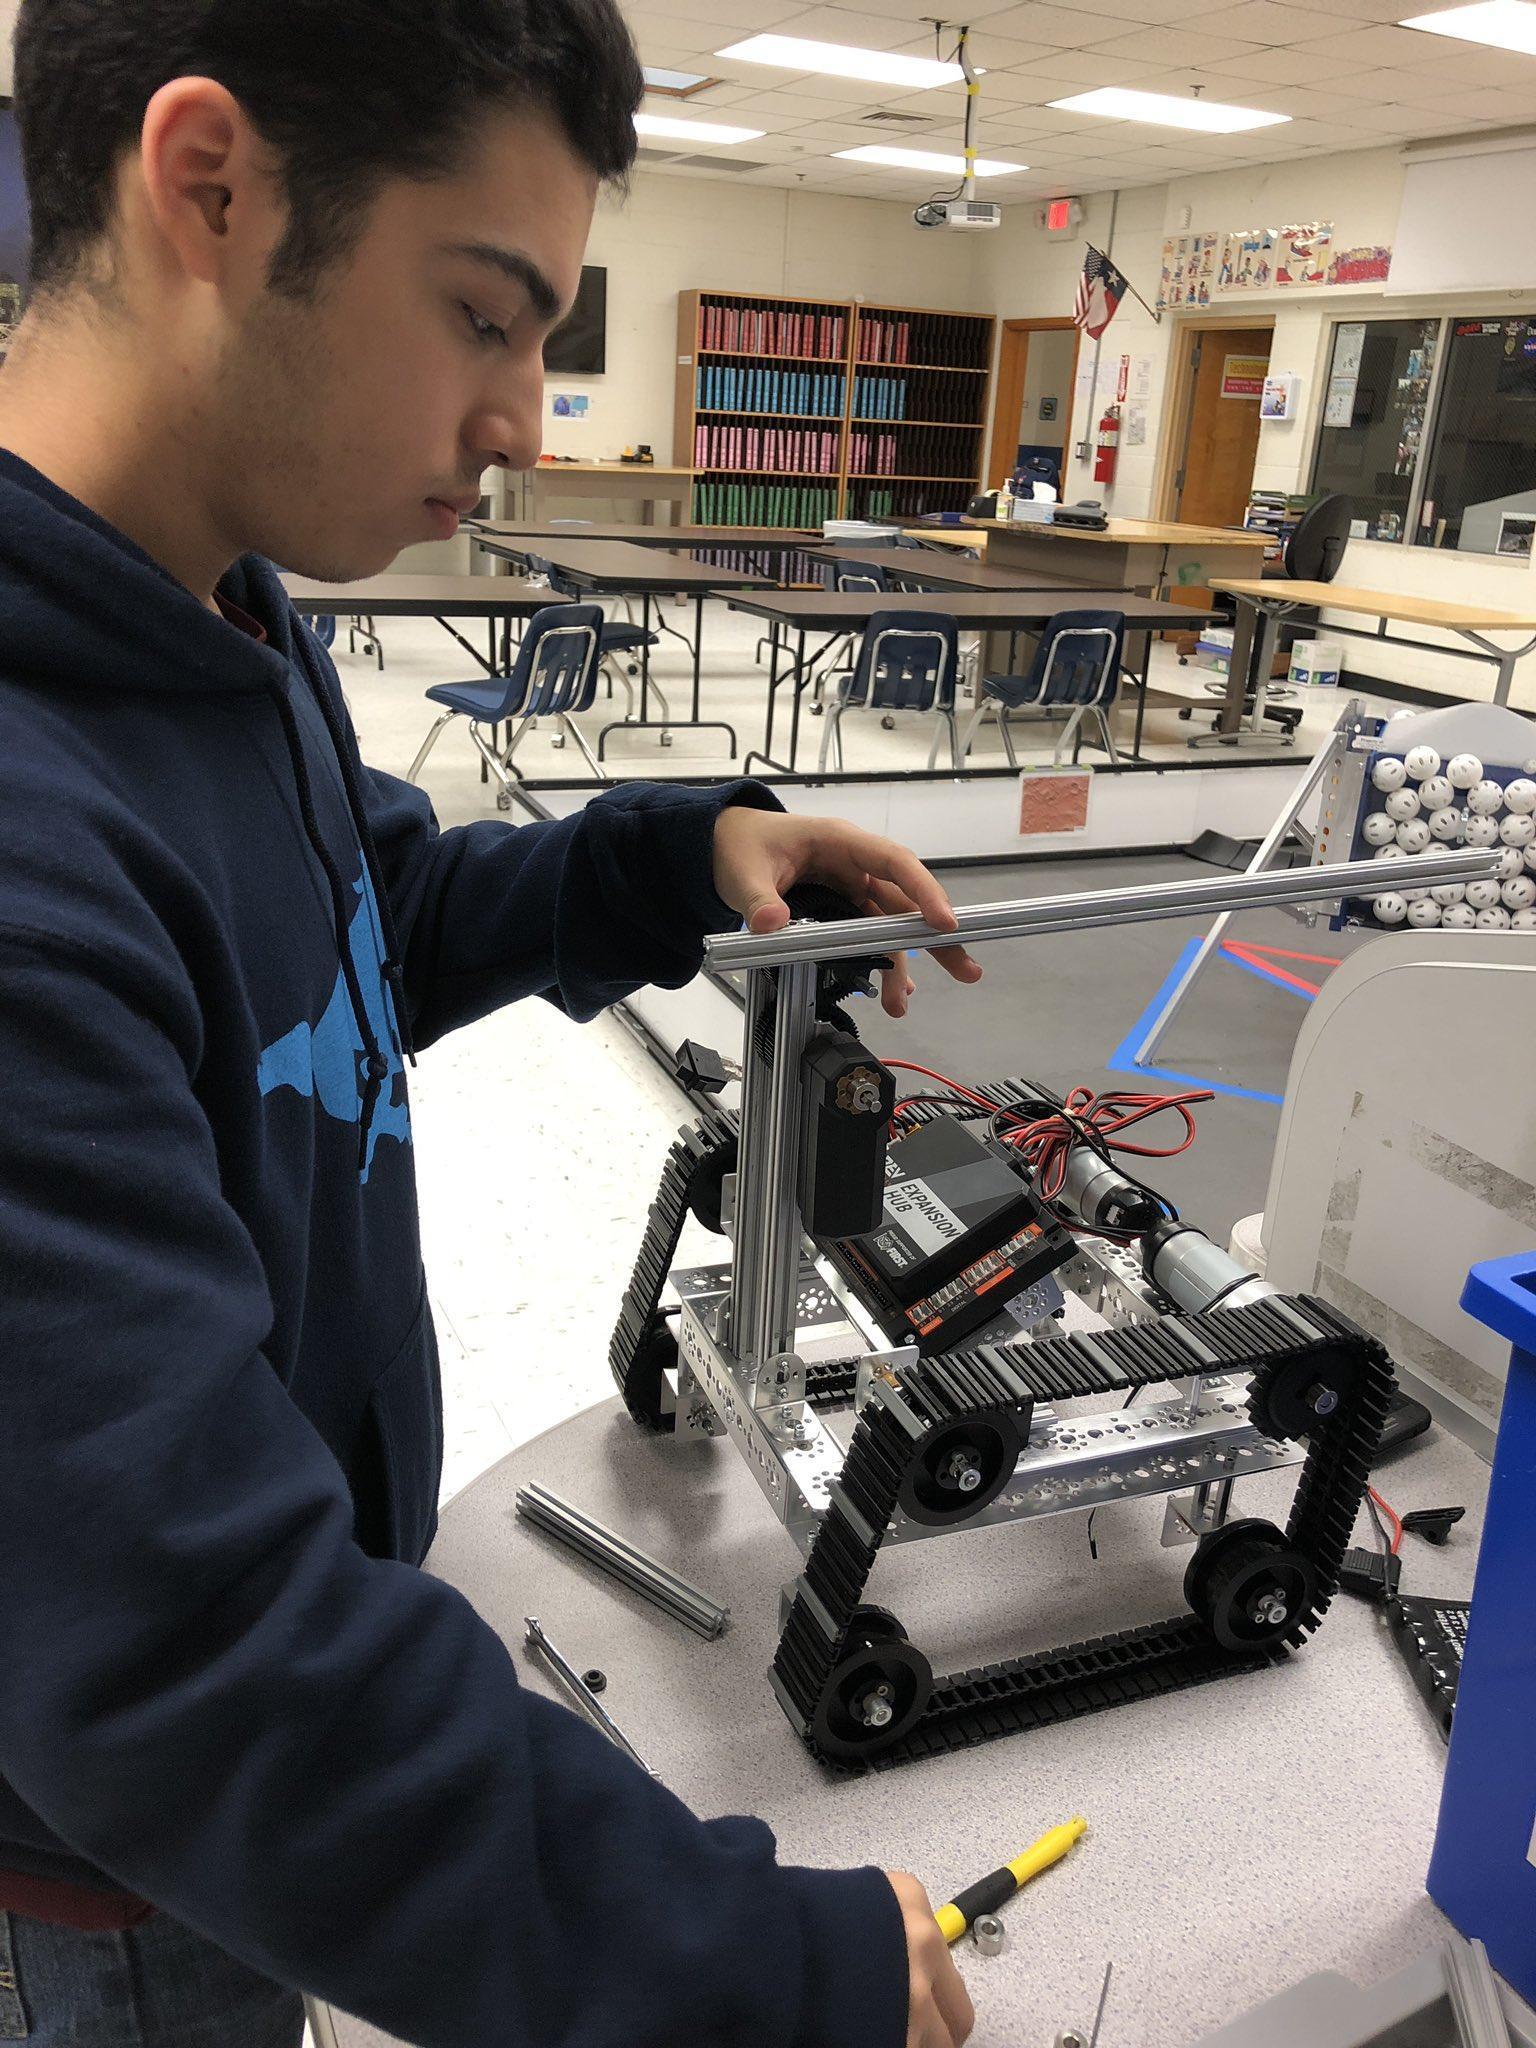 student working on robotics project